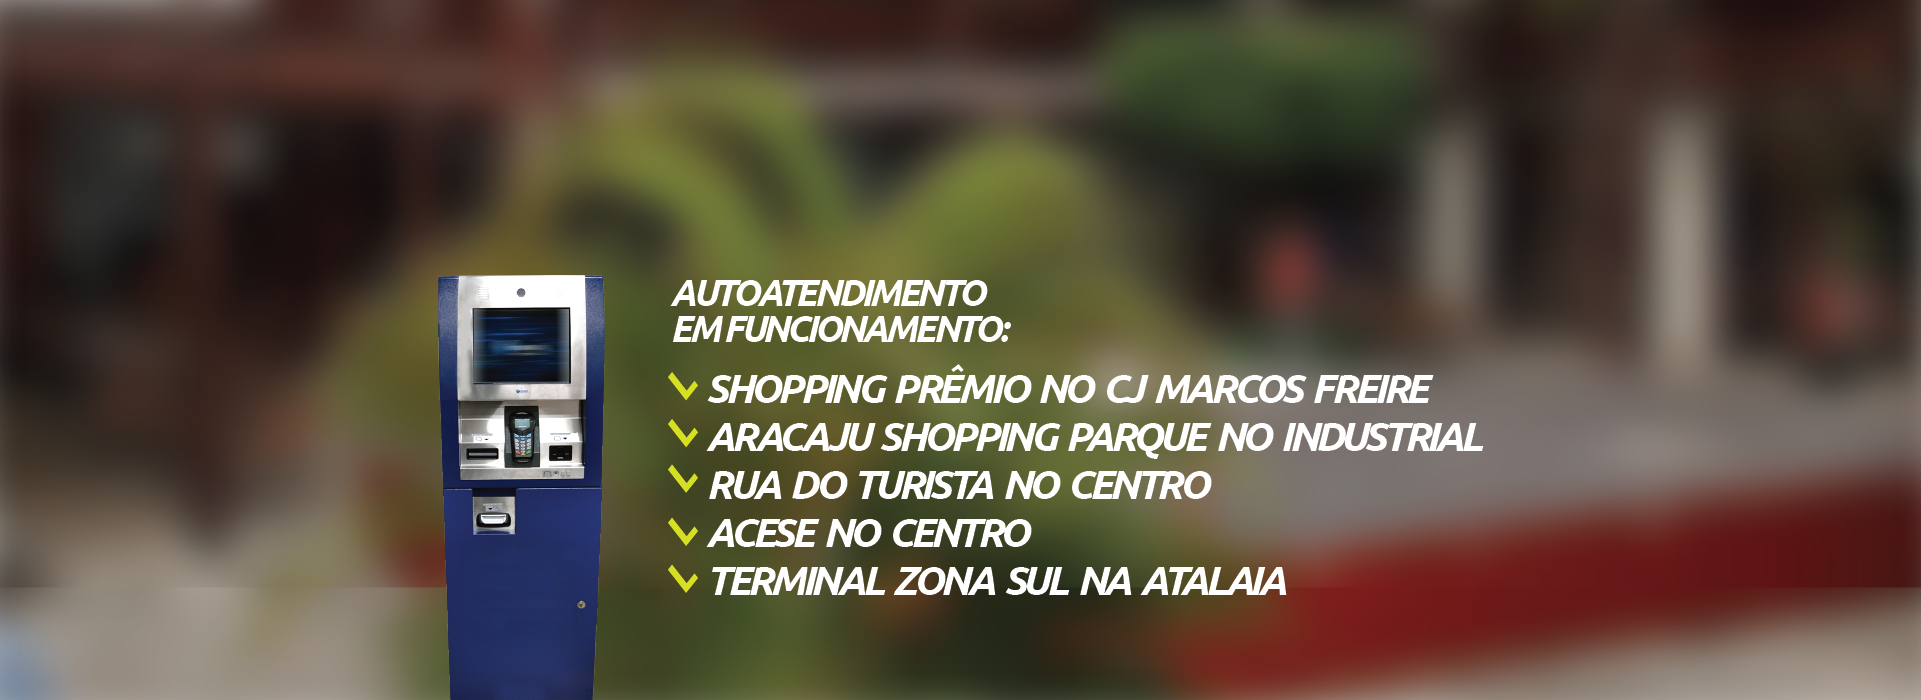 03_Display-home_Site-Aracajucard-02